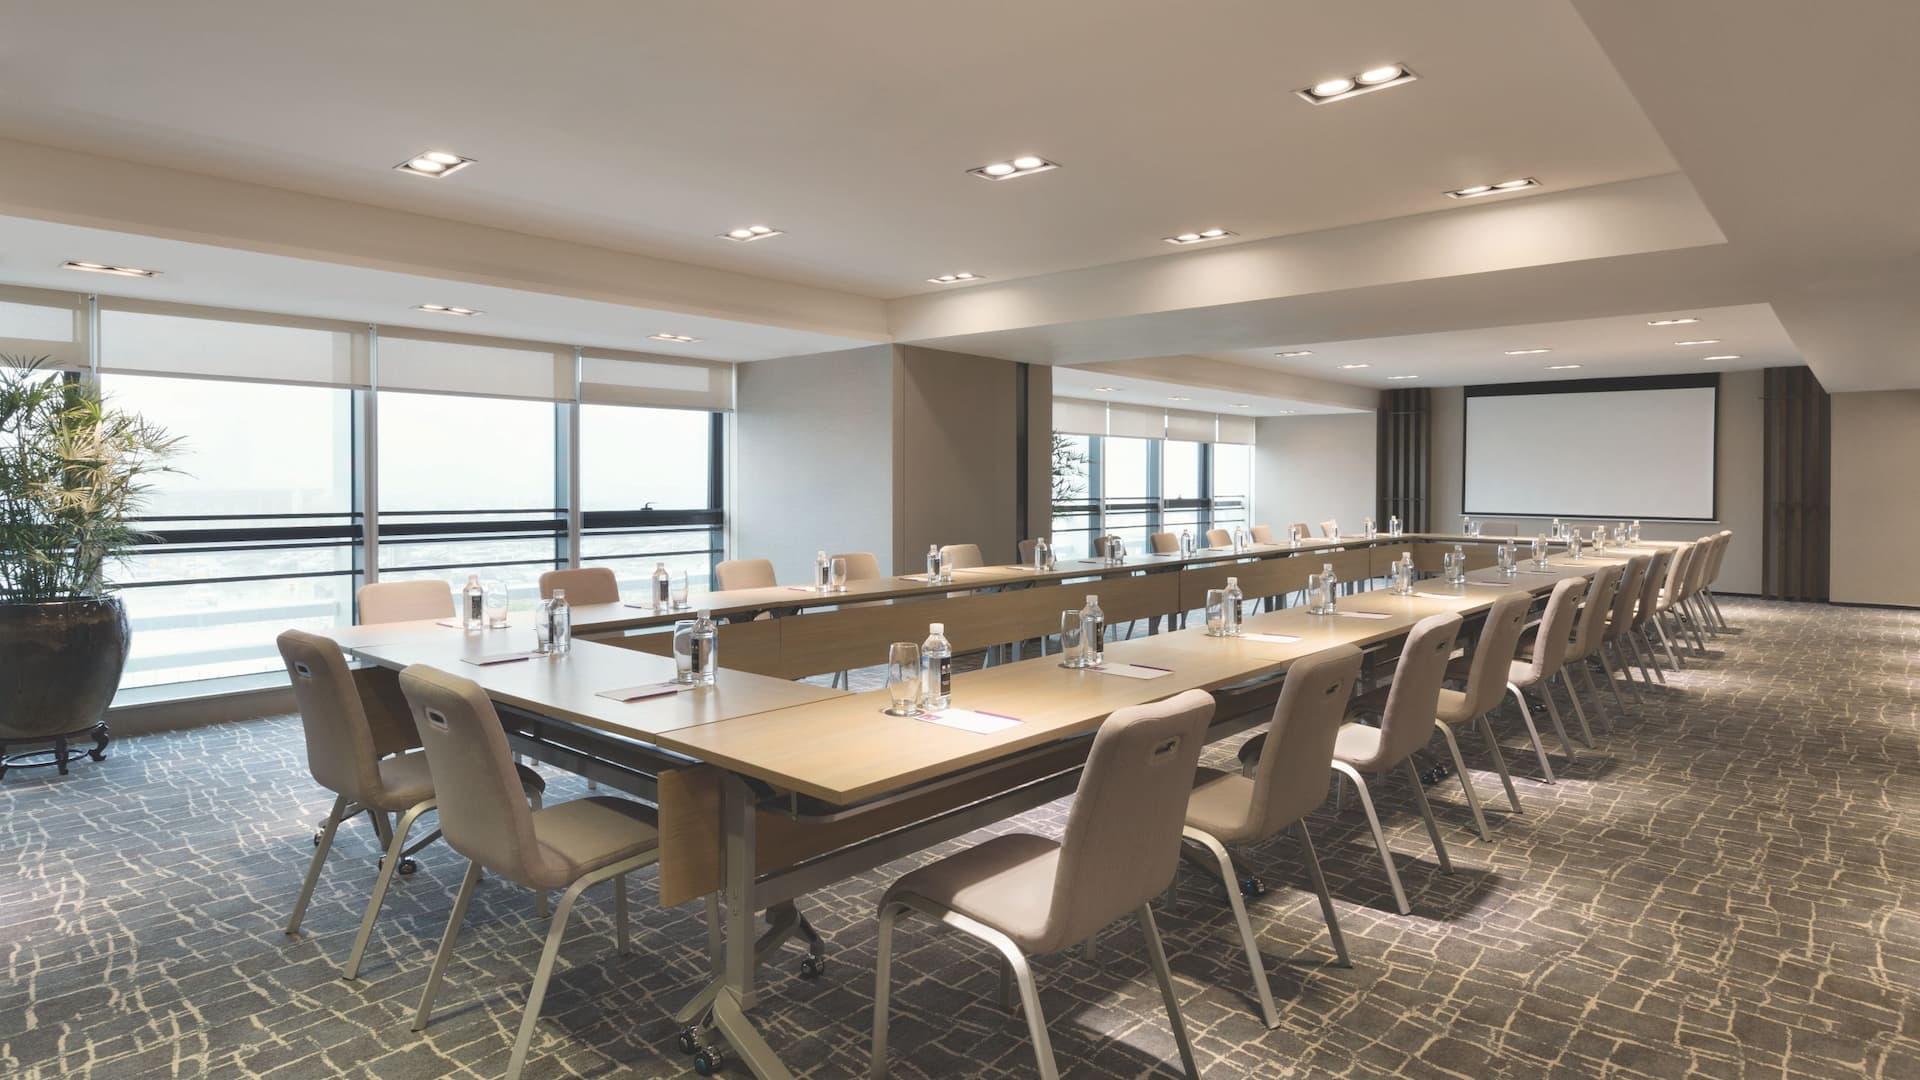 Hyatt House Shenzhen Airport Meeting Room Hollow Square